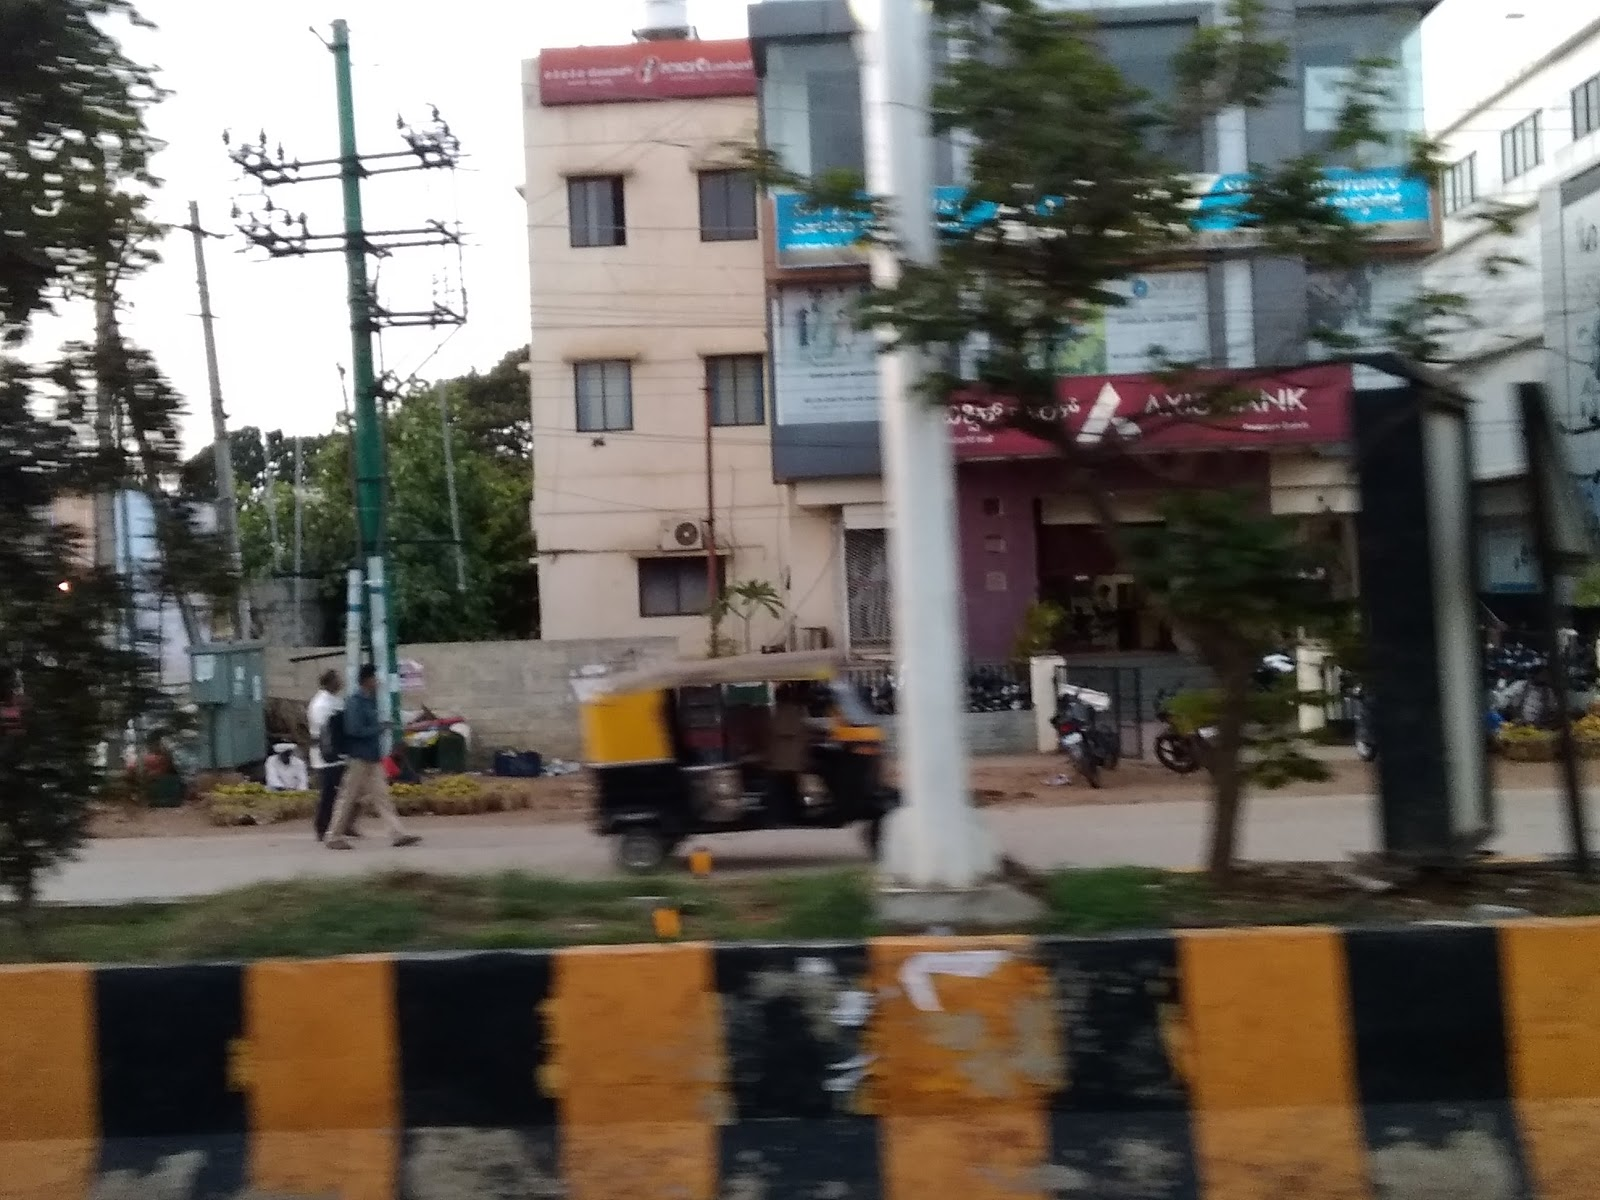 blood bank Axis Bank near Davanagere Karnataka